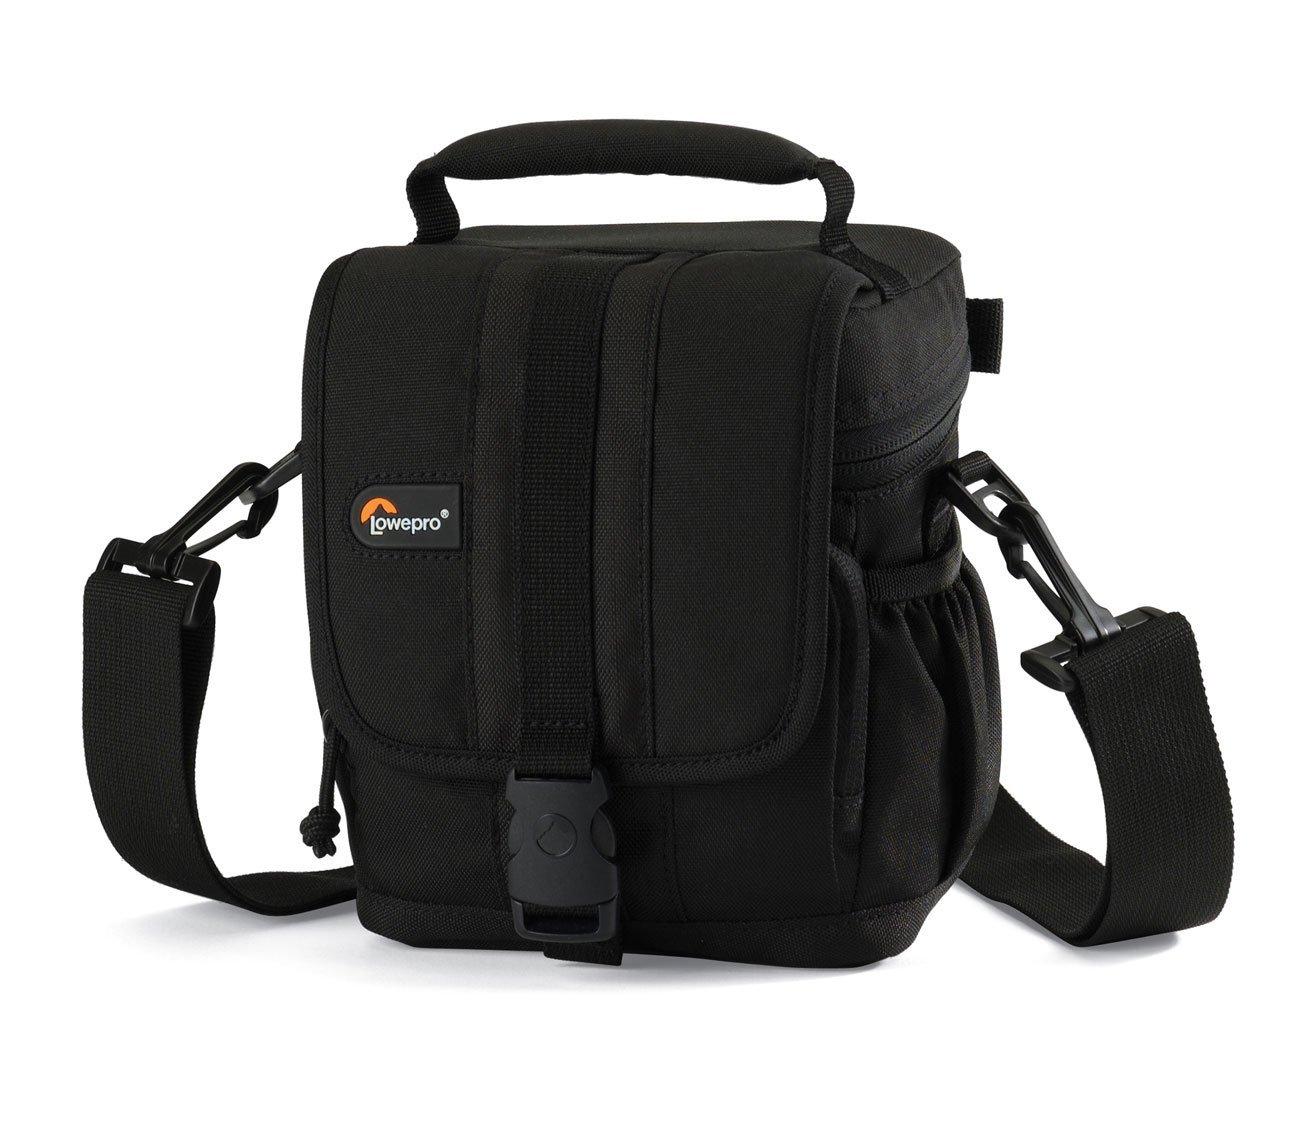 Lowepro Adventura 120 Camera Shoulder Bag for DSLR or Mirrorless